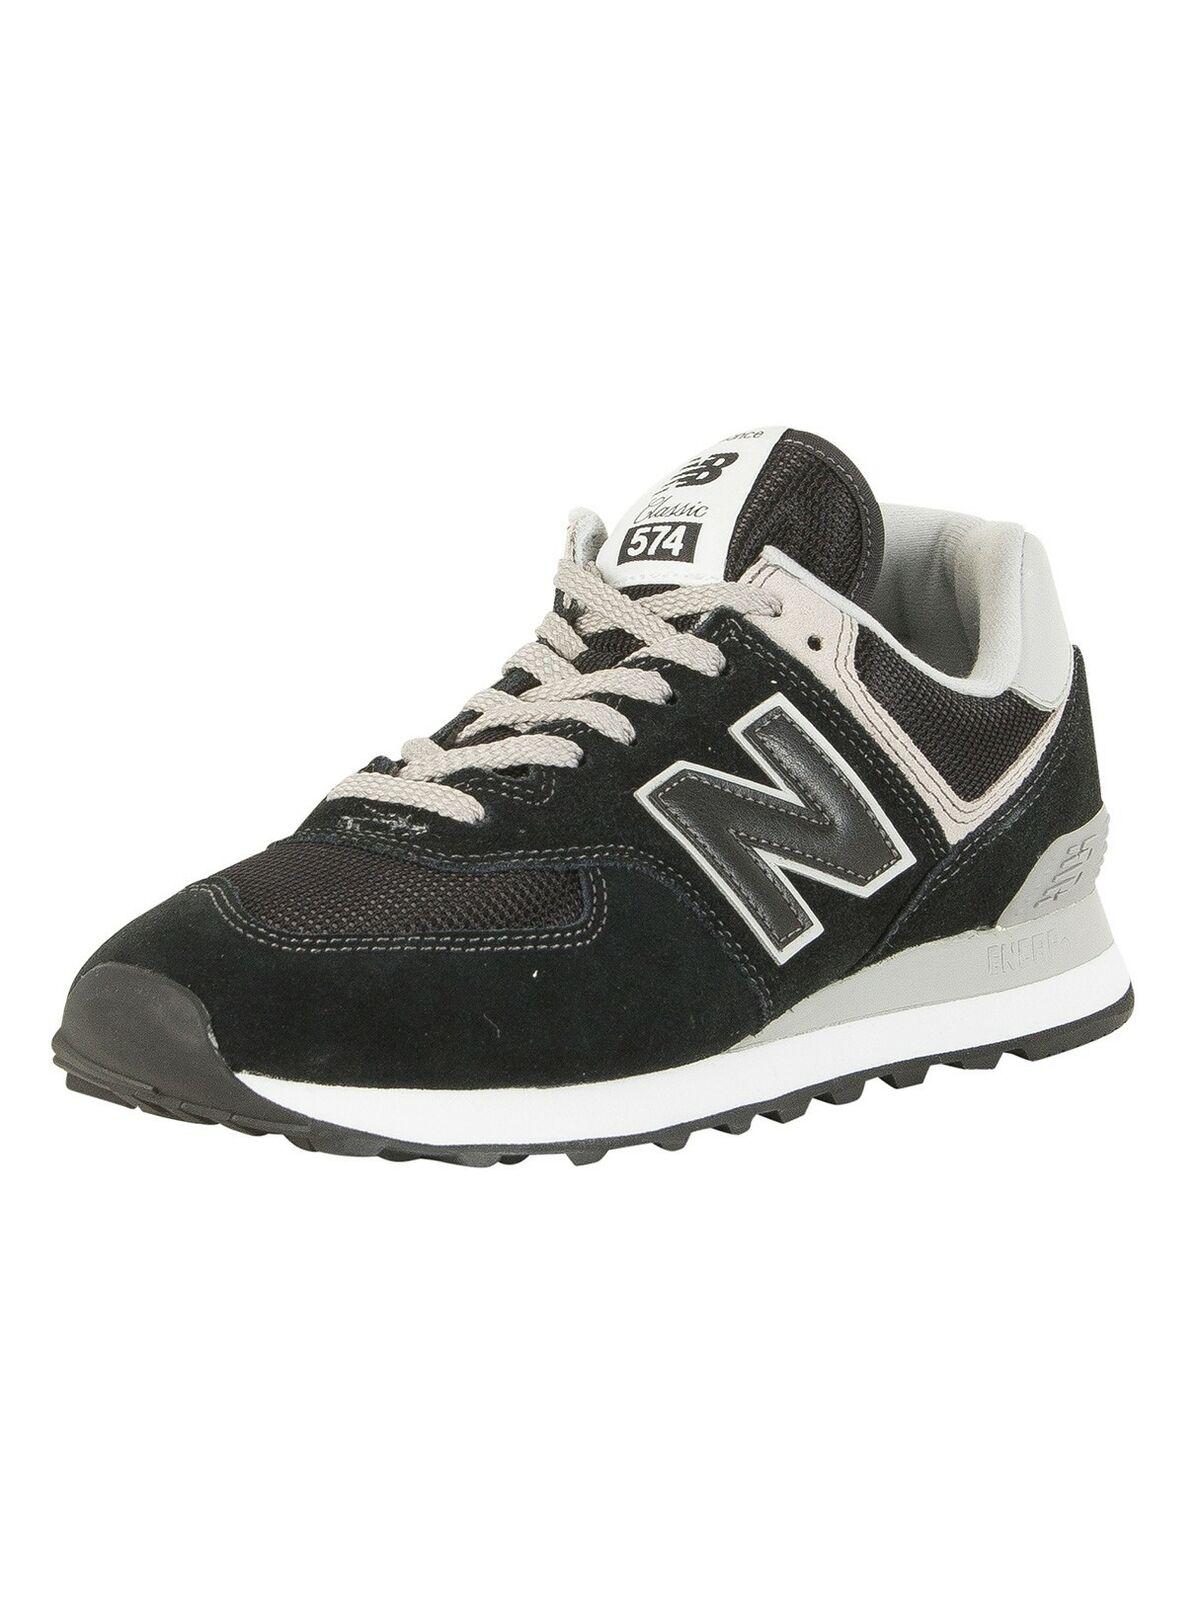 New Balance Men's 574 Trainers, Black